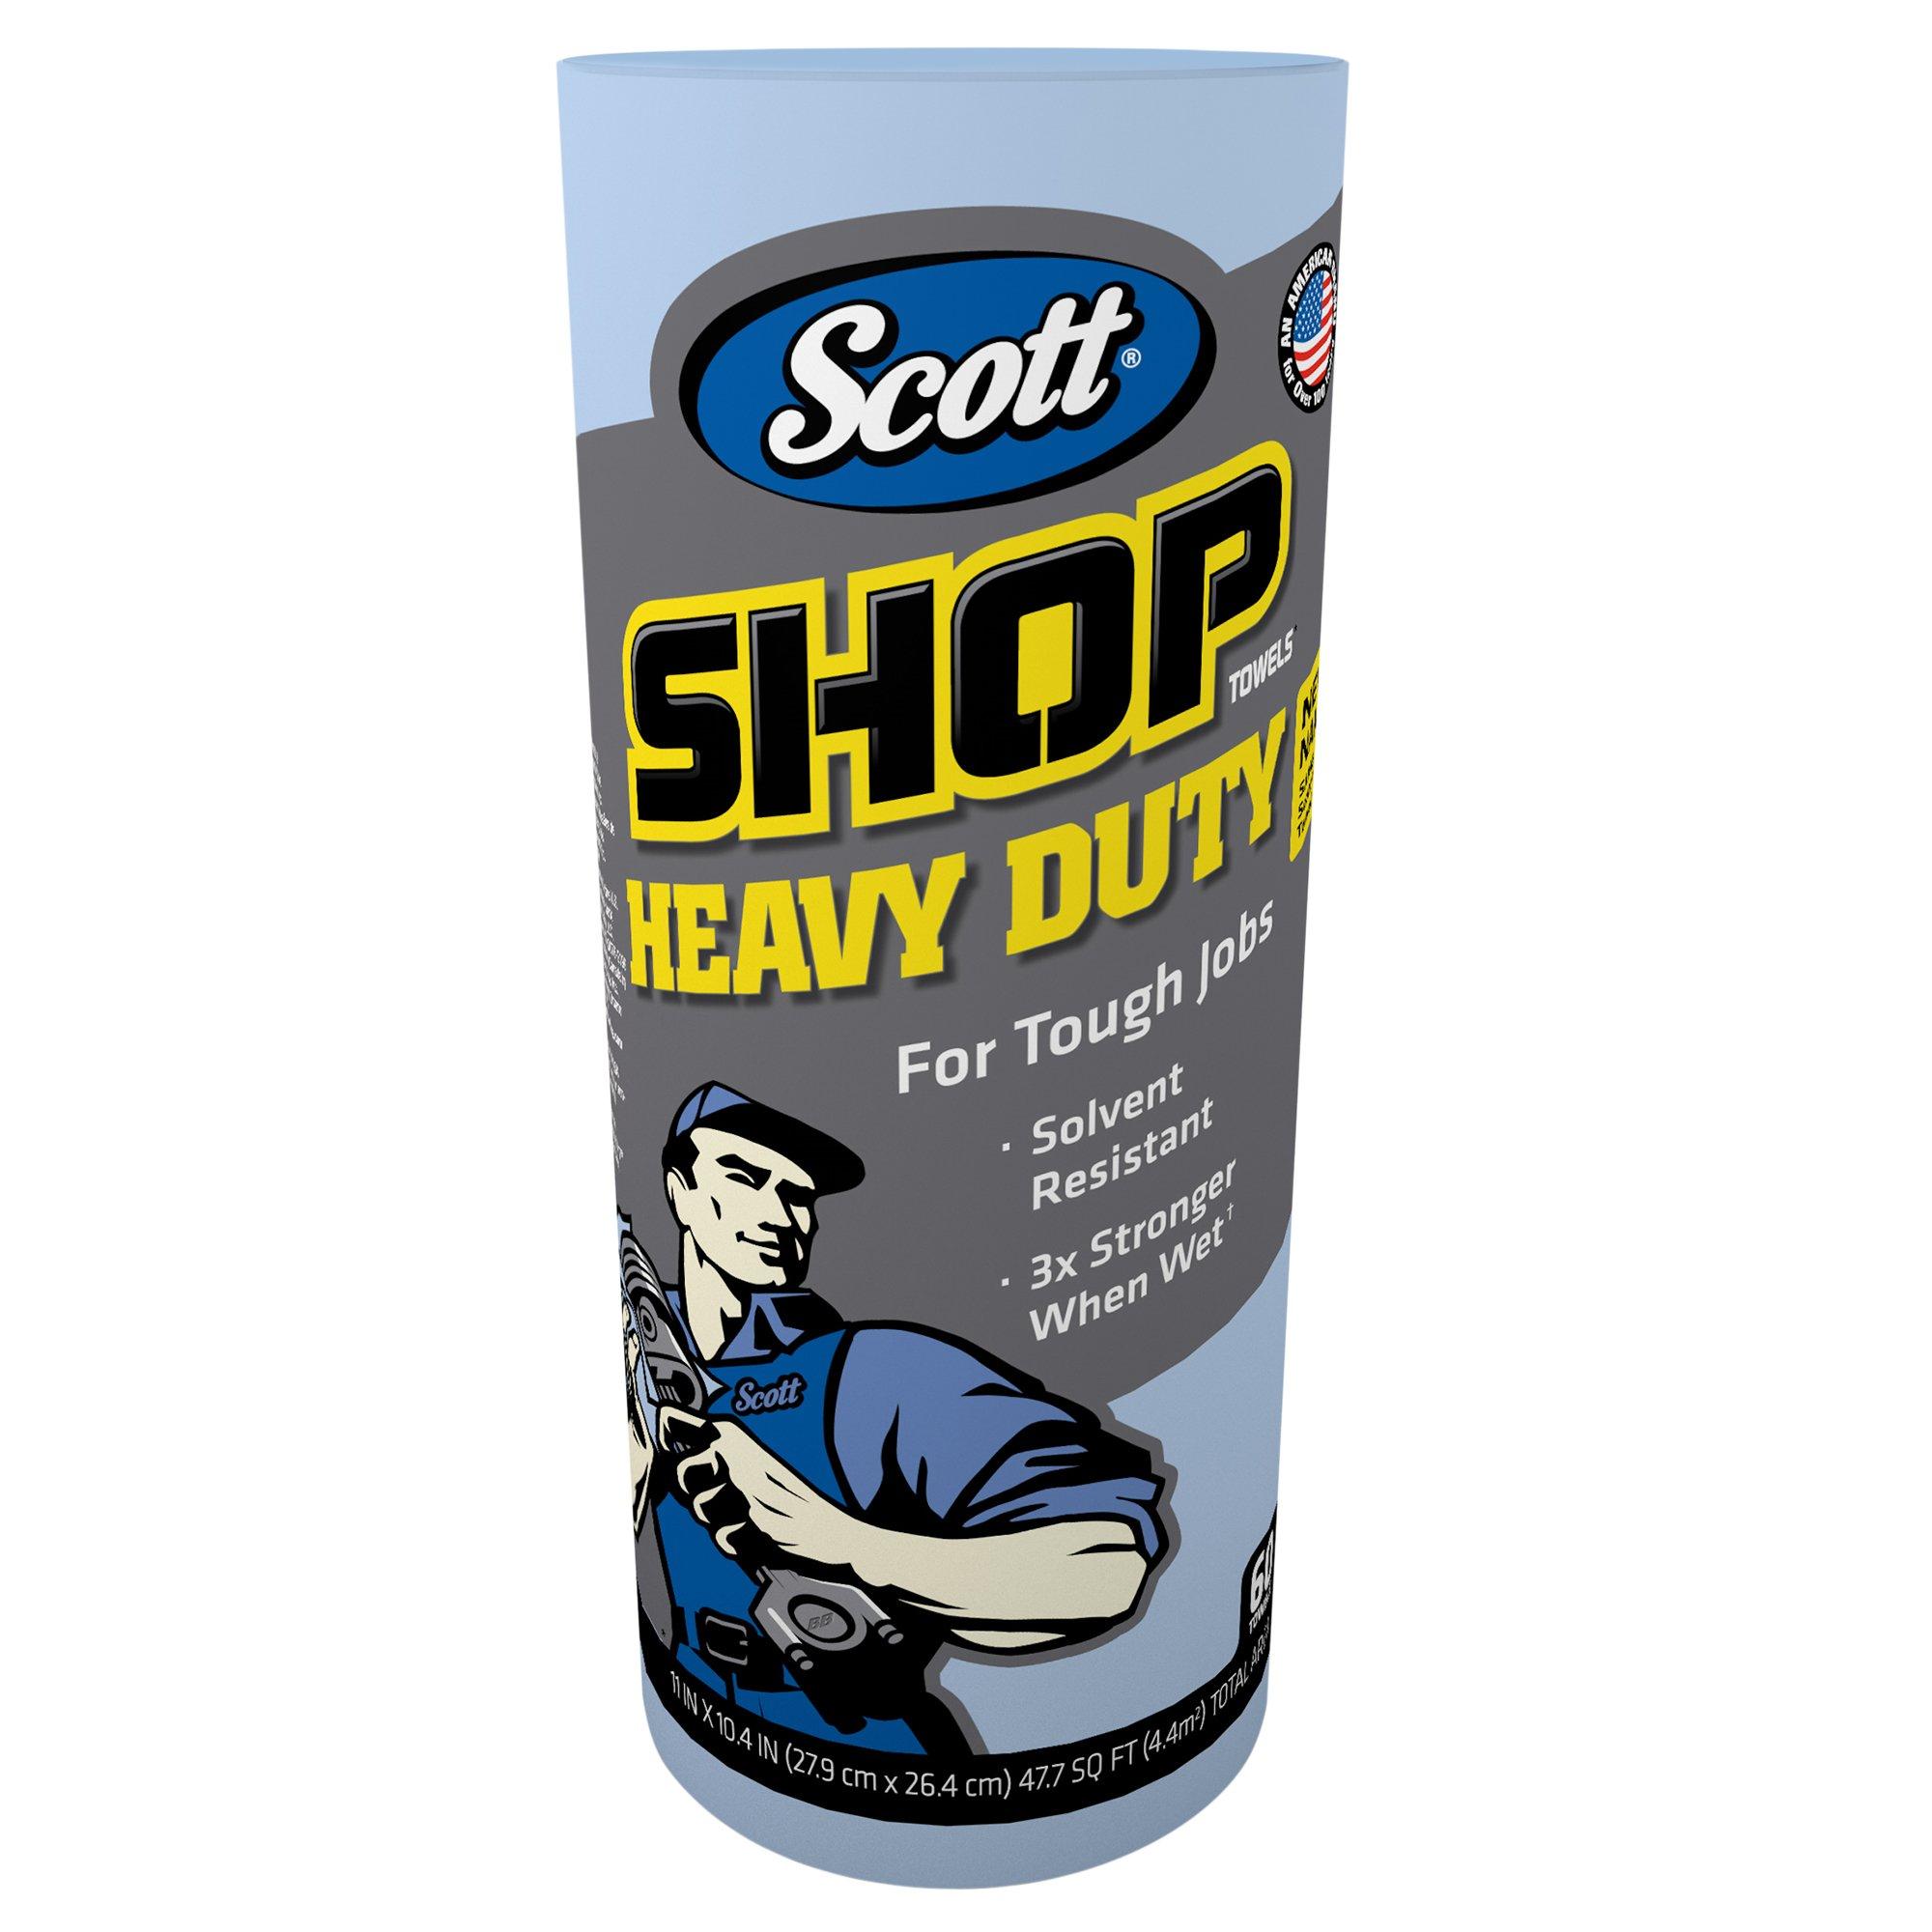 Scott 32992 Pro Shop Towels, Heavy Duty, 1-Ply, Blue, 10 2/5'' x 11'' (Case of 12 Rolls) by Kimberly-Clark Professional